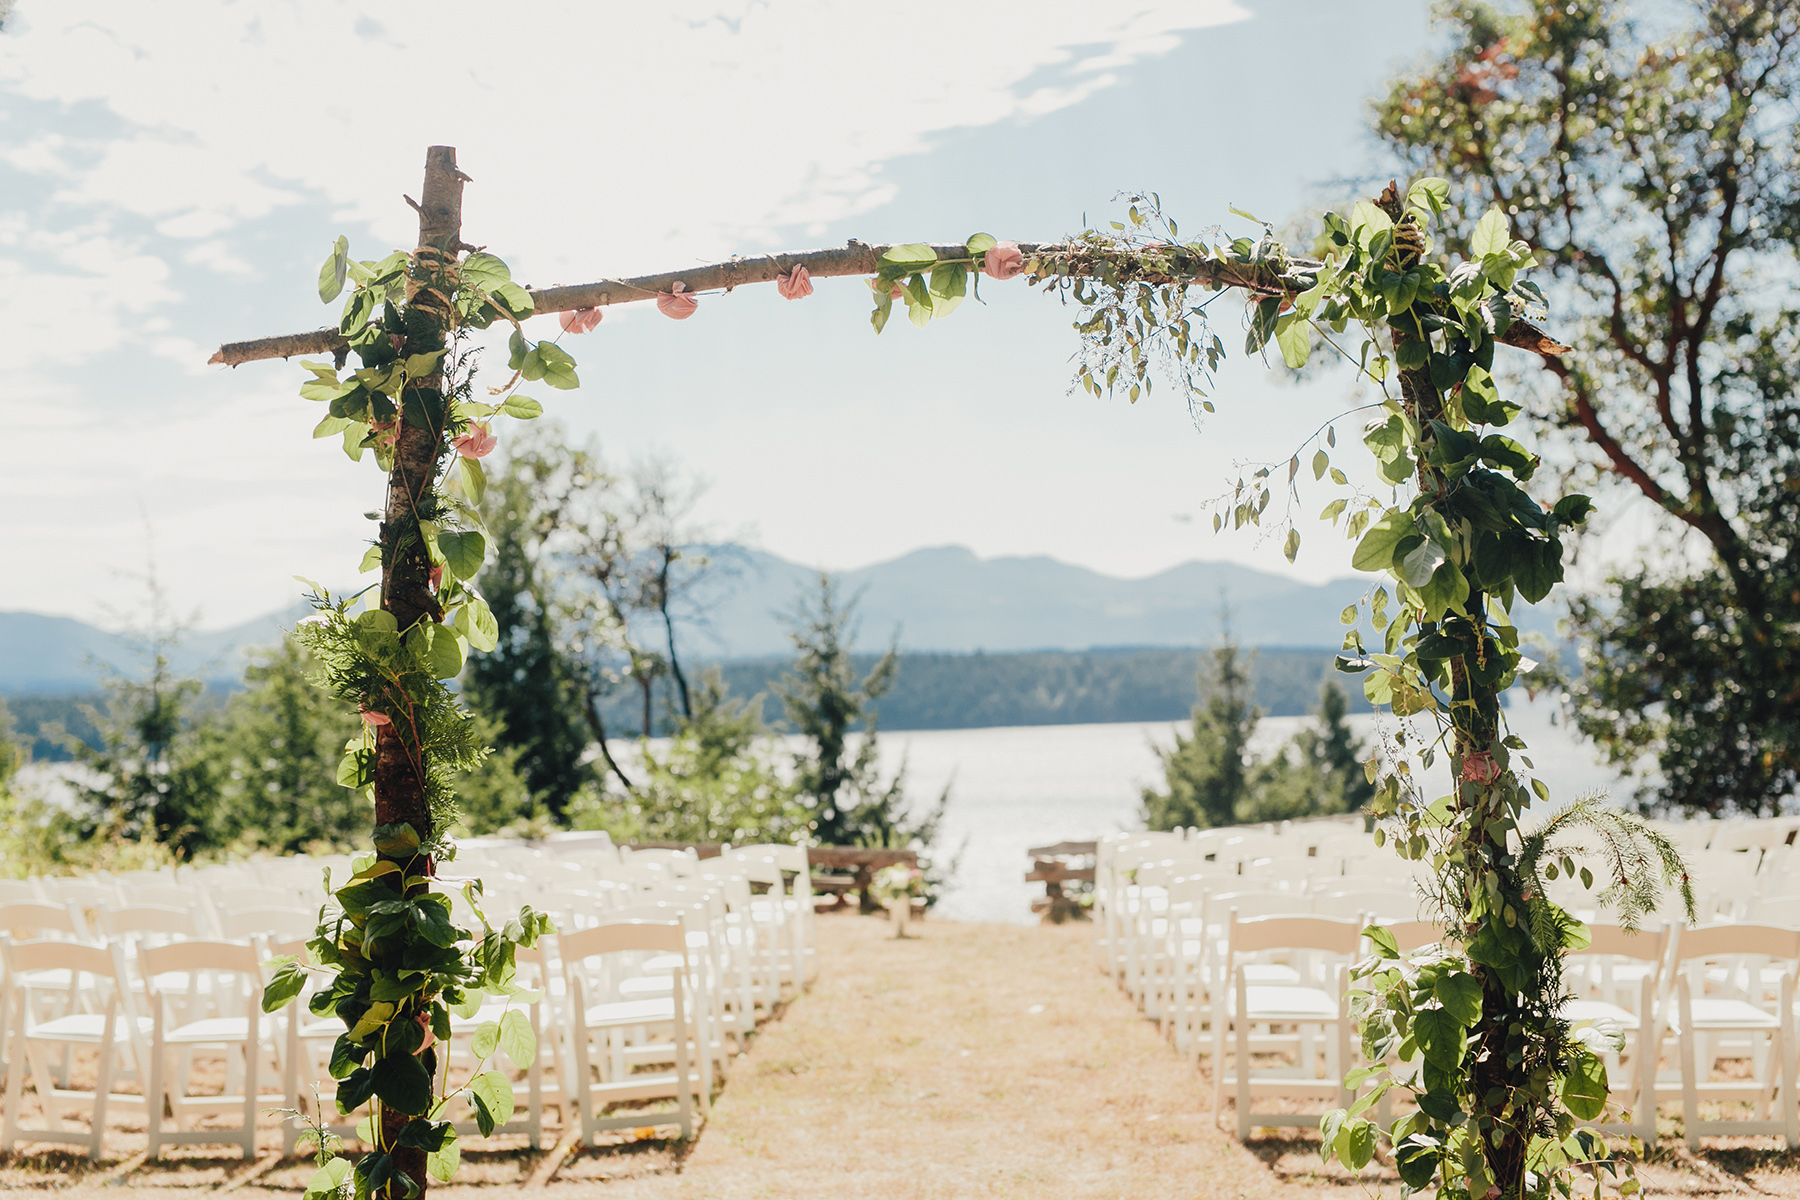 bodega-ridge-wedding-photos-0054.jpg